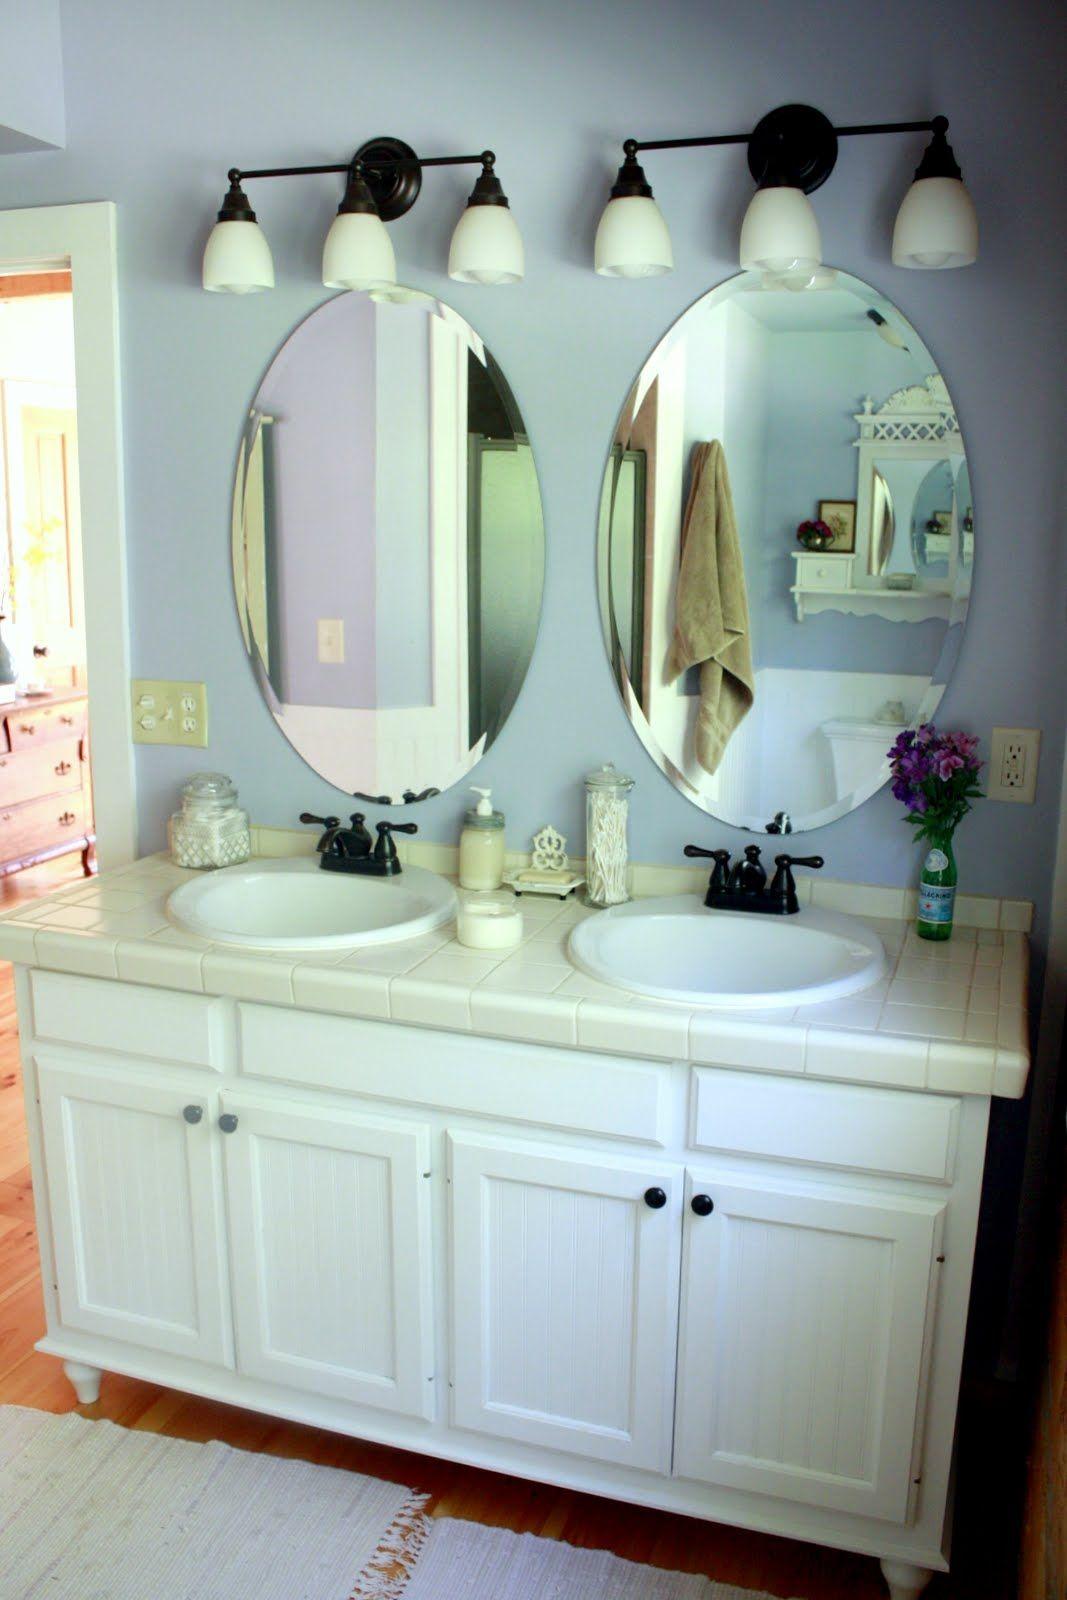 Bathroom mirror ideas diy for a small bathroom pinterest